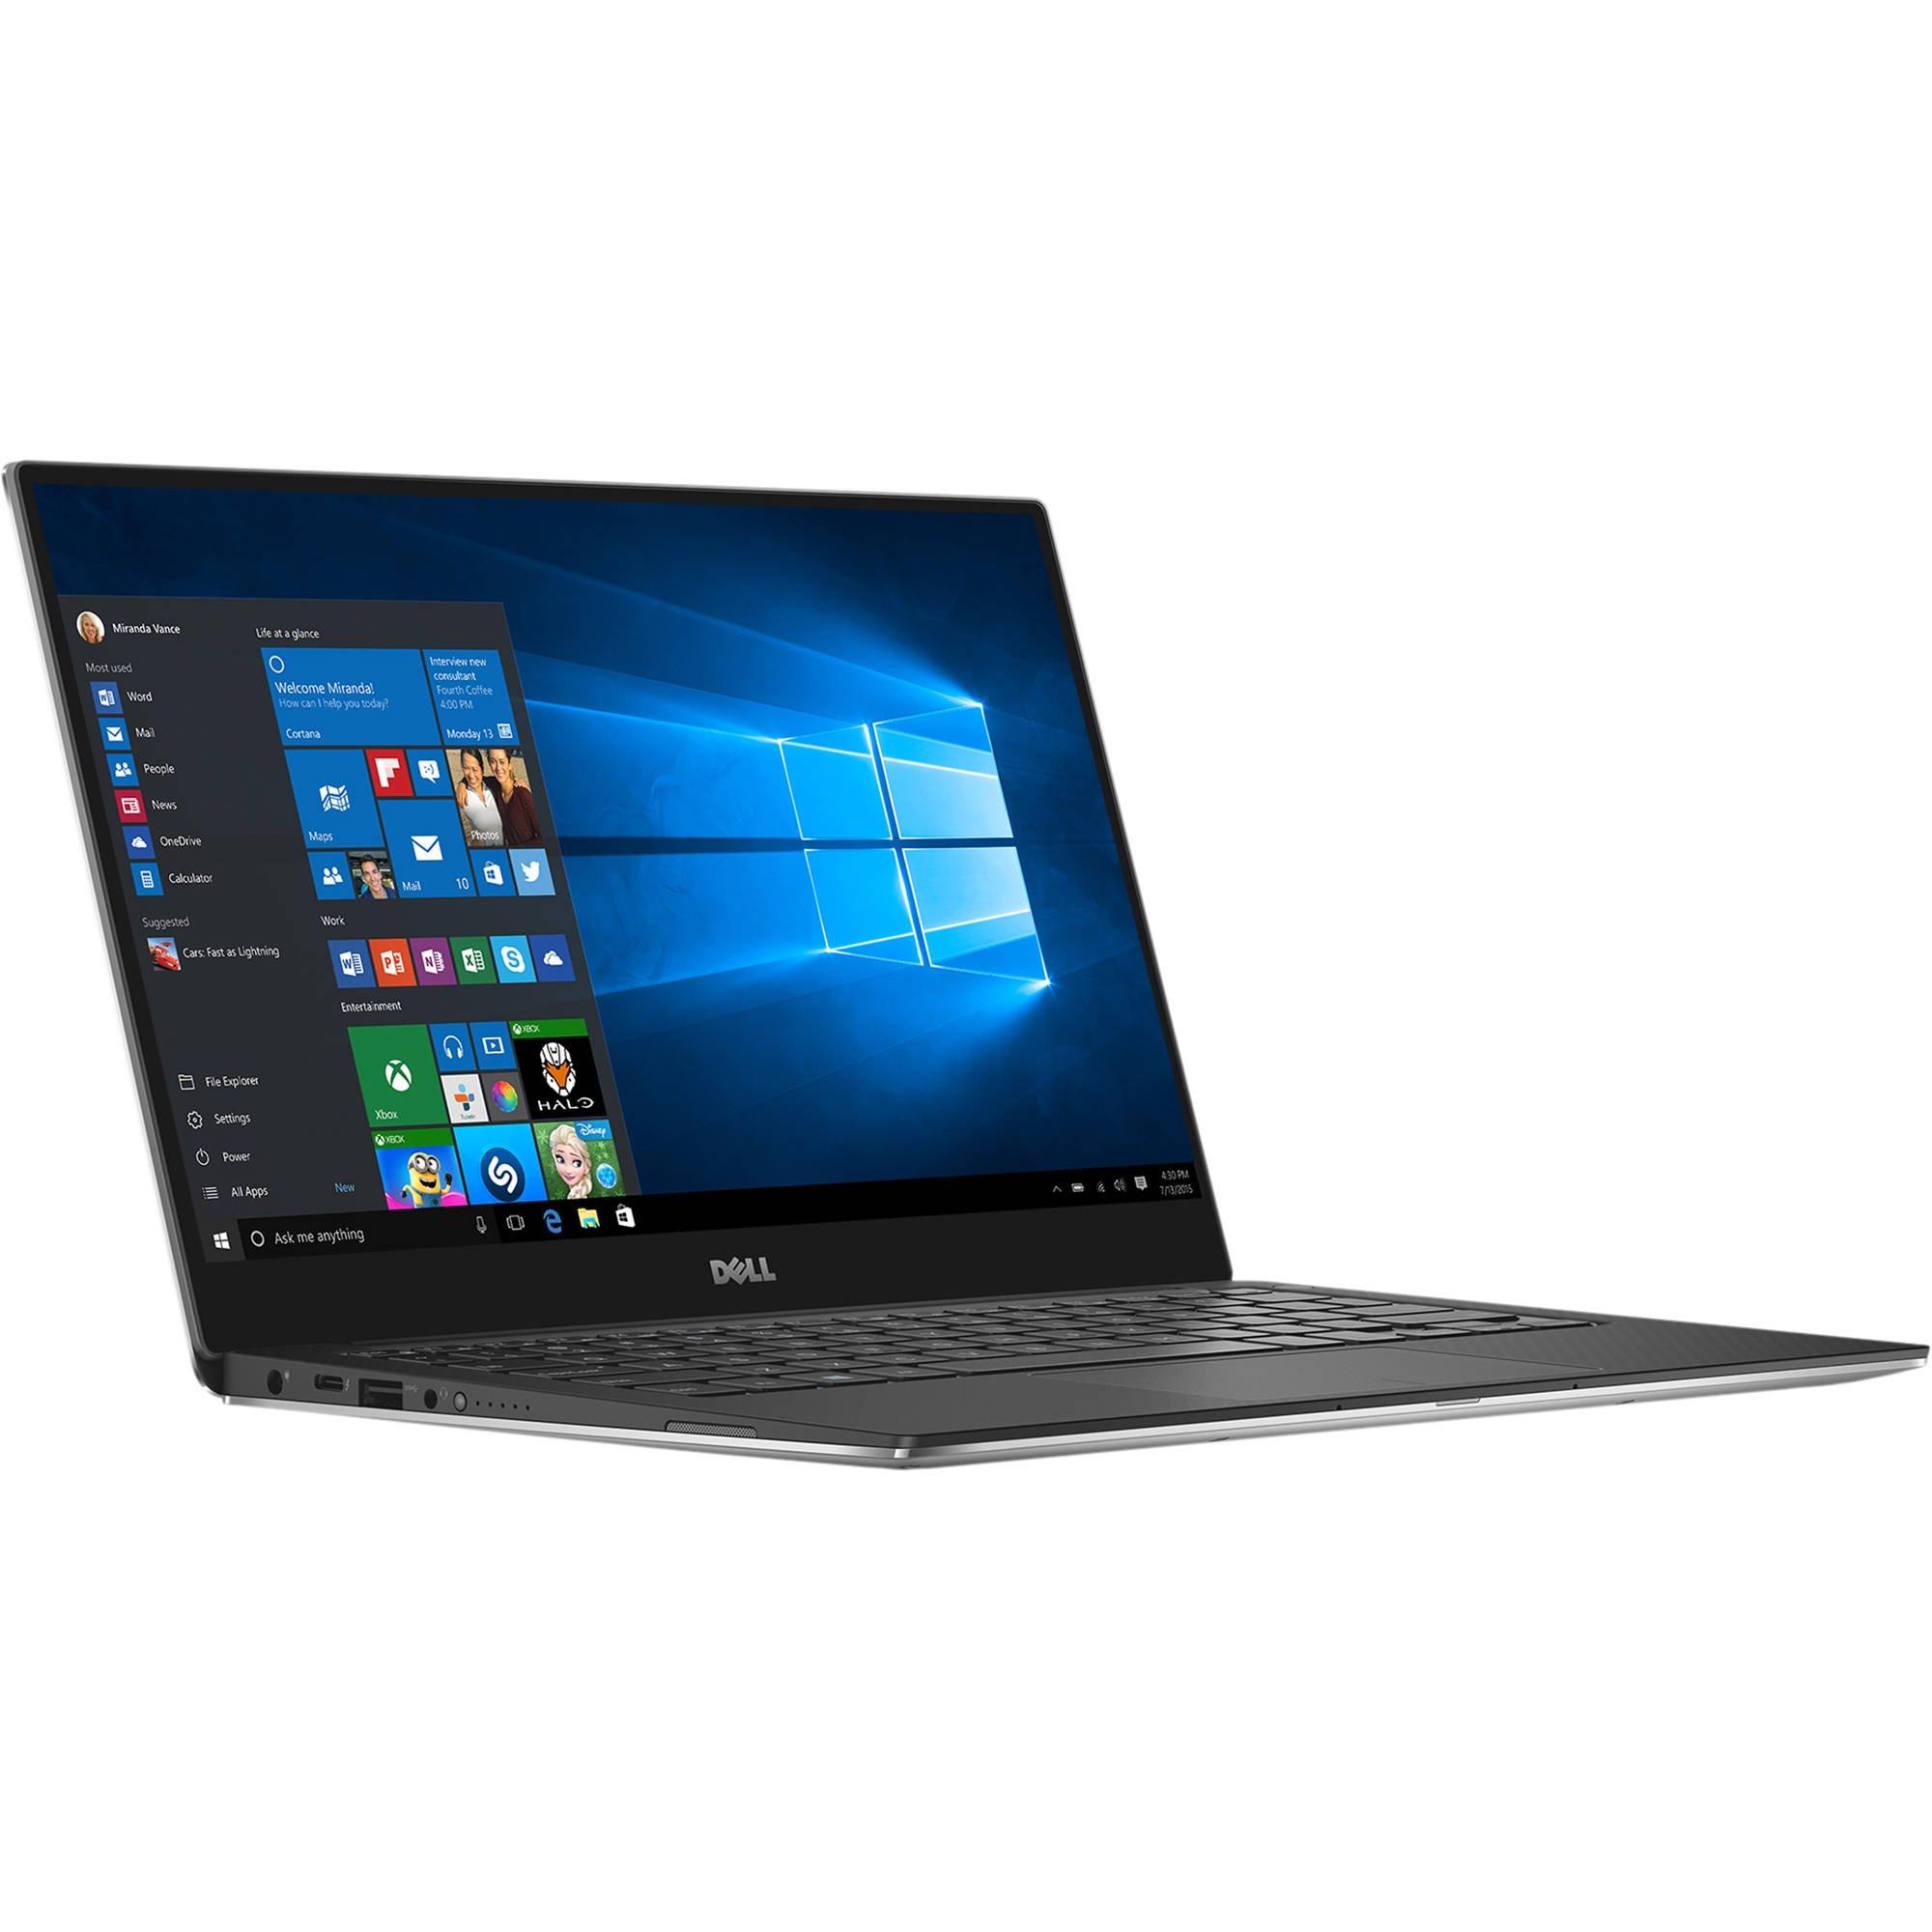 "Dell XPS 13 9360 Laptop - 13.3"" Anti-Glare InfinityEdge TouchScreen FHD (1920x1080), Intel Quad-Core i5-8250U, 512GB NVME PCIe SSD, 8GB RAM, Backlit Keyboard, Thunderbolt 3, Windows 10 - Silver"